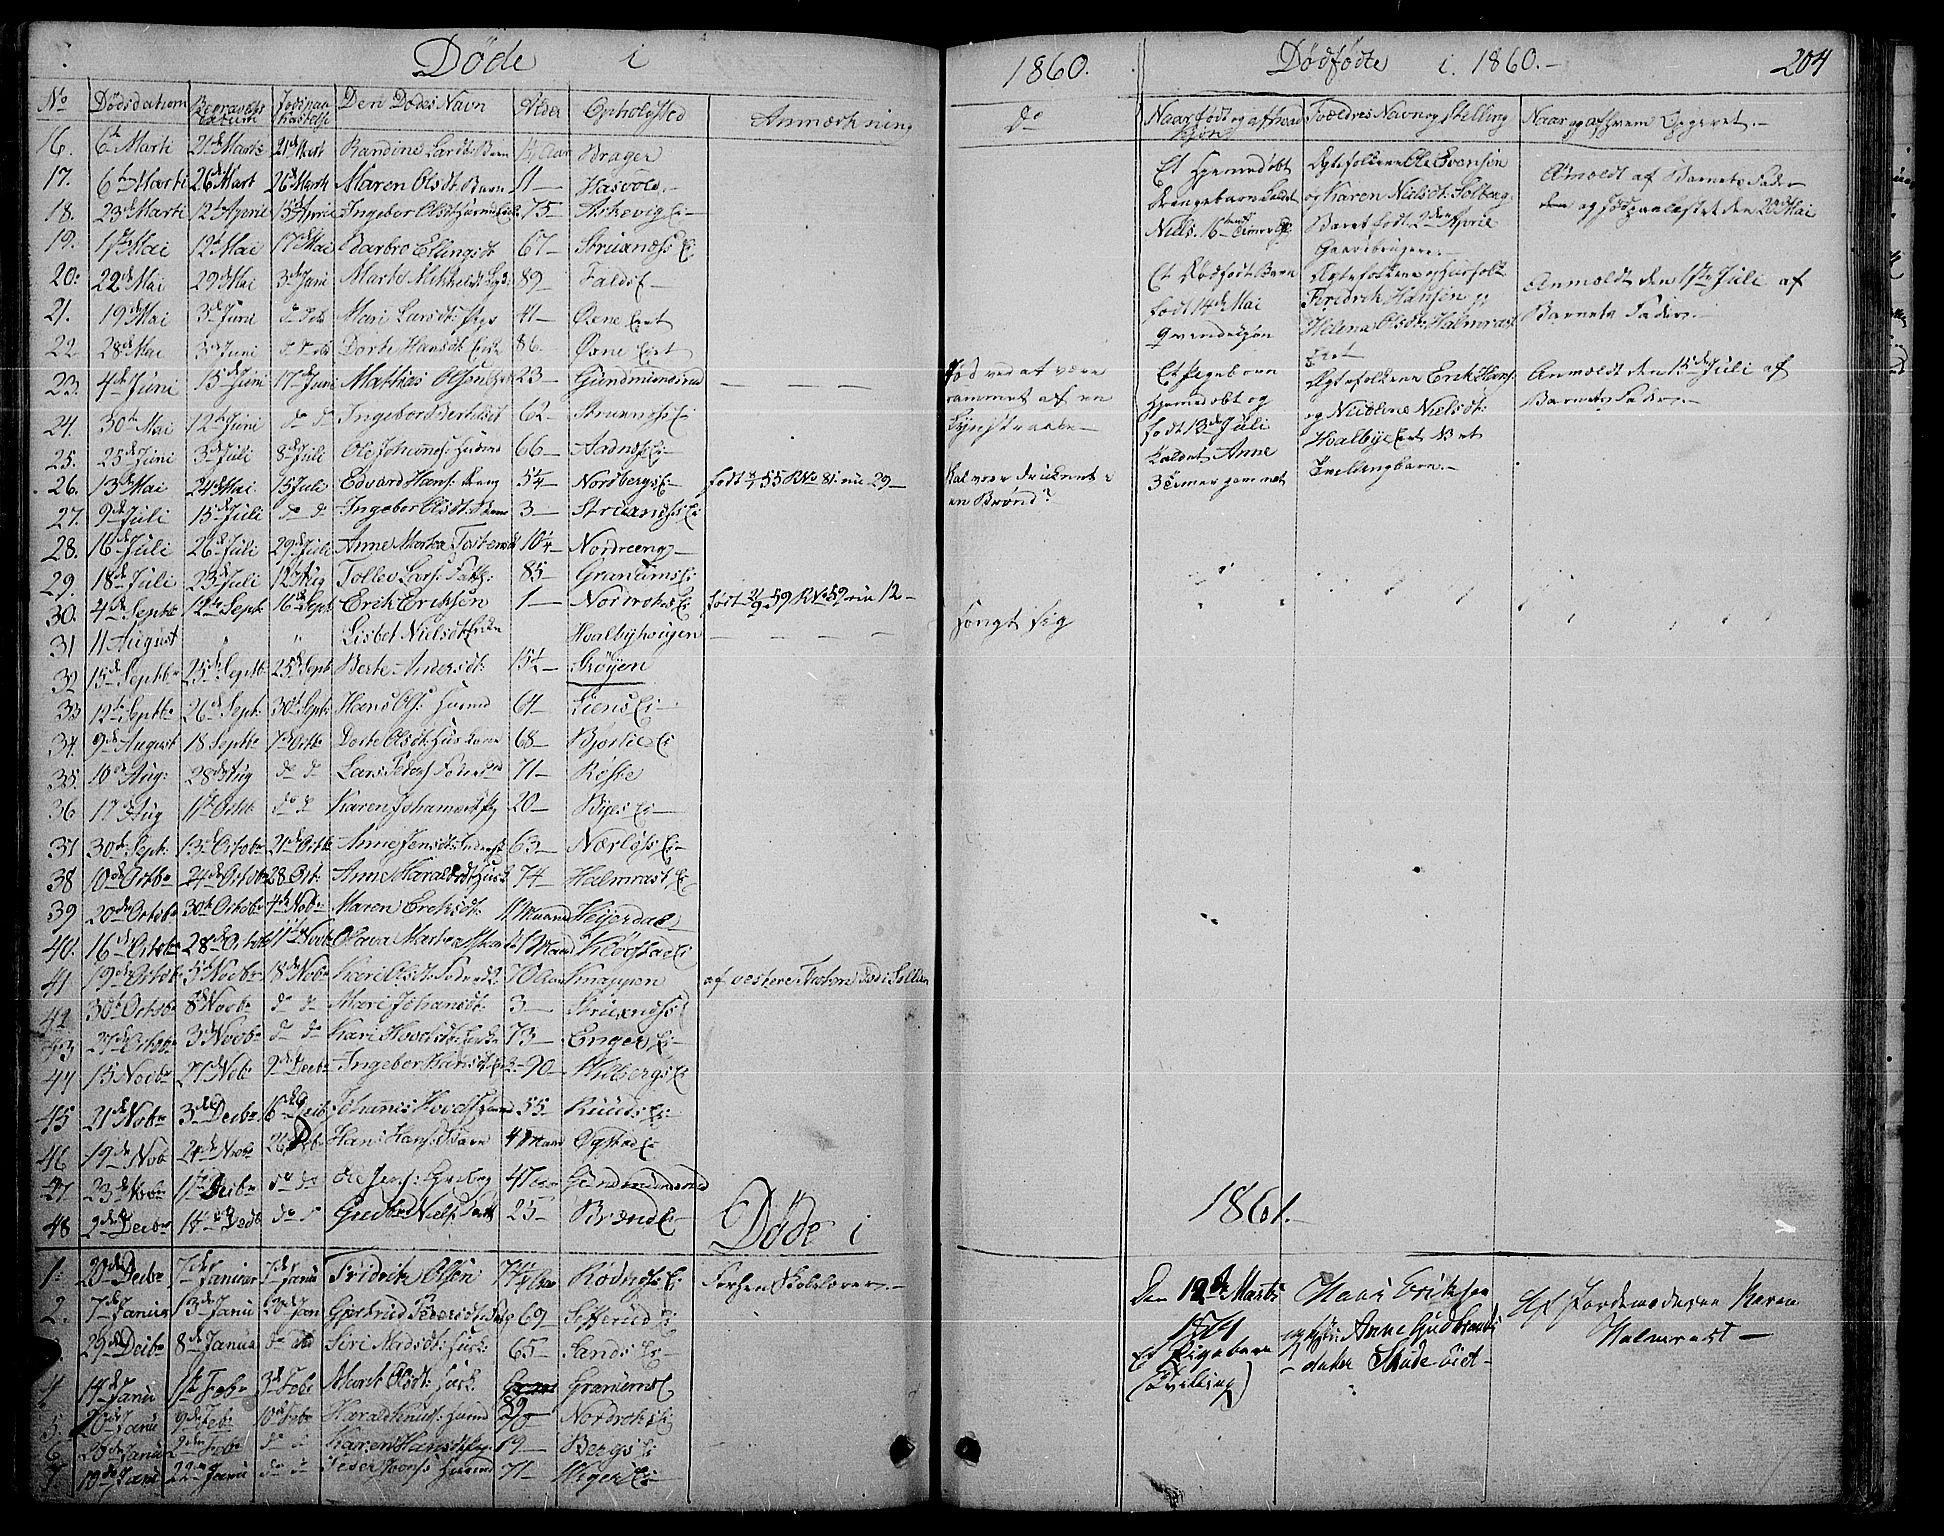 SAH, Søndre Land prestekontor, L/L0001: Klokkerbok nr. 1, 1849-1883, s. 204